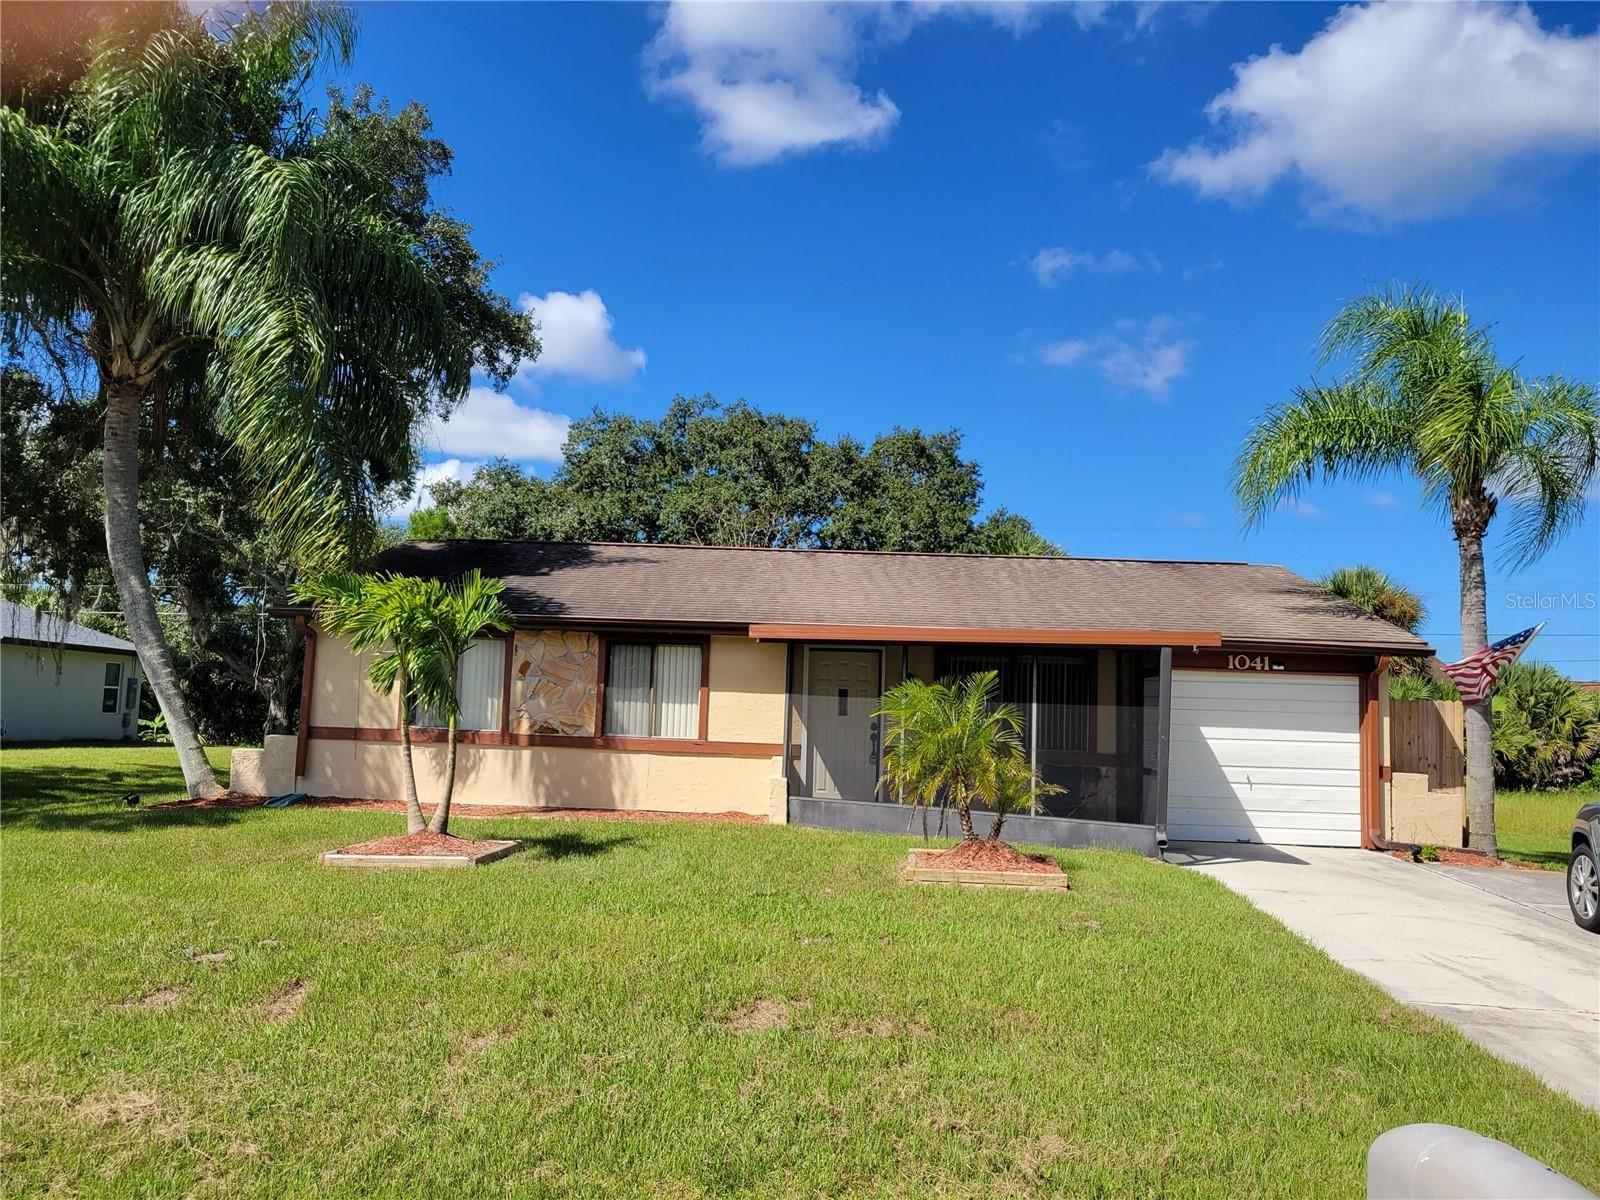 1041 GUILD STREET, Port Charlotte, FL 33952 - #: A4513892